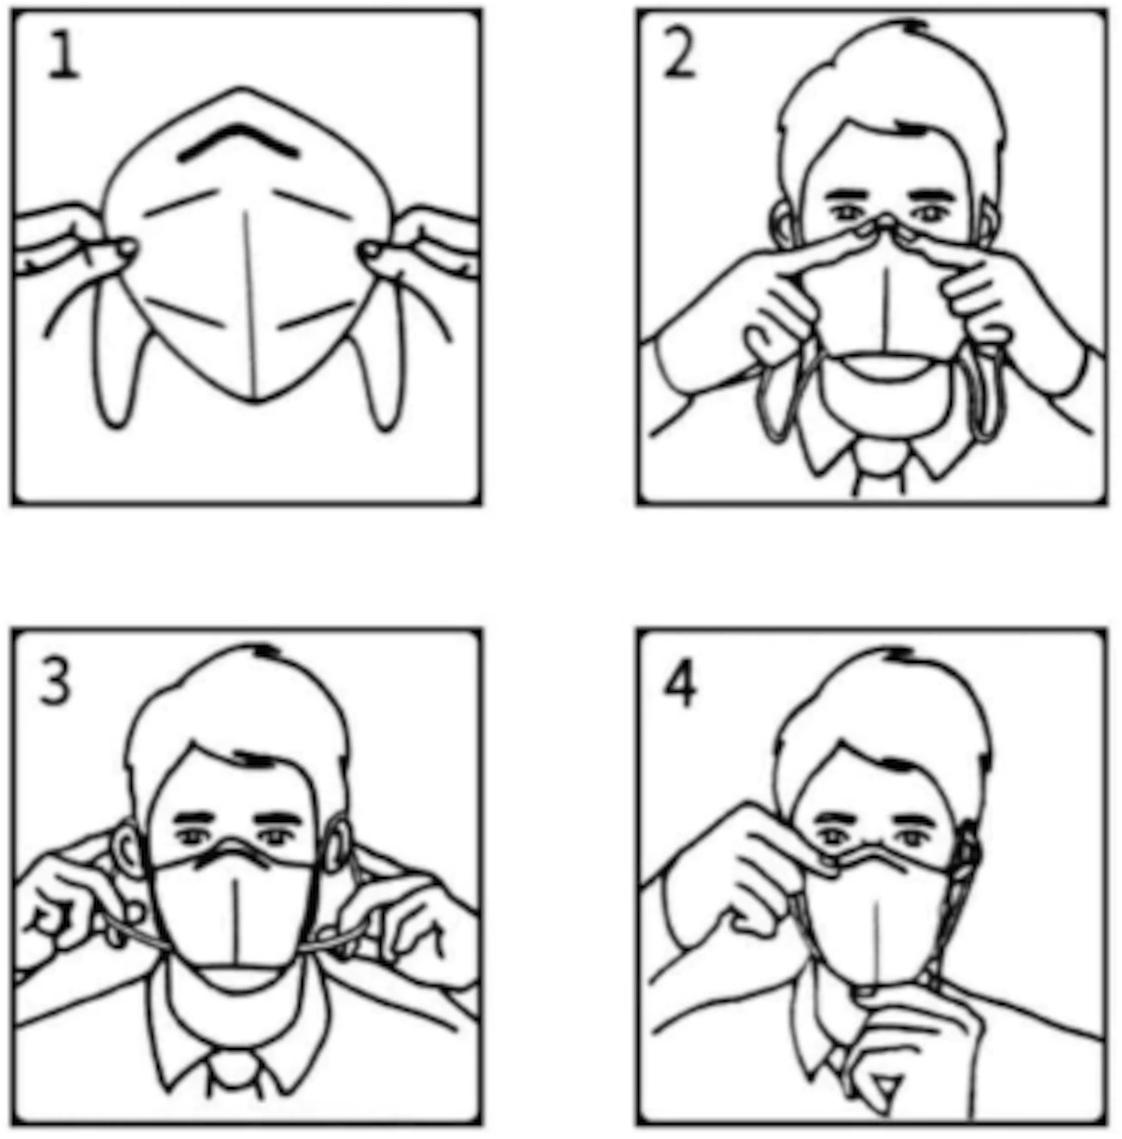 Viren Schutzmaske korrekt anlegen